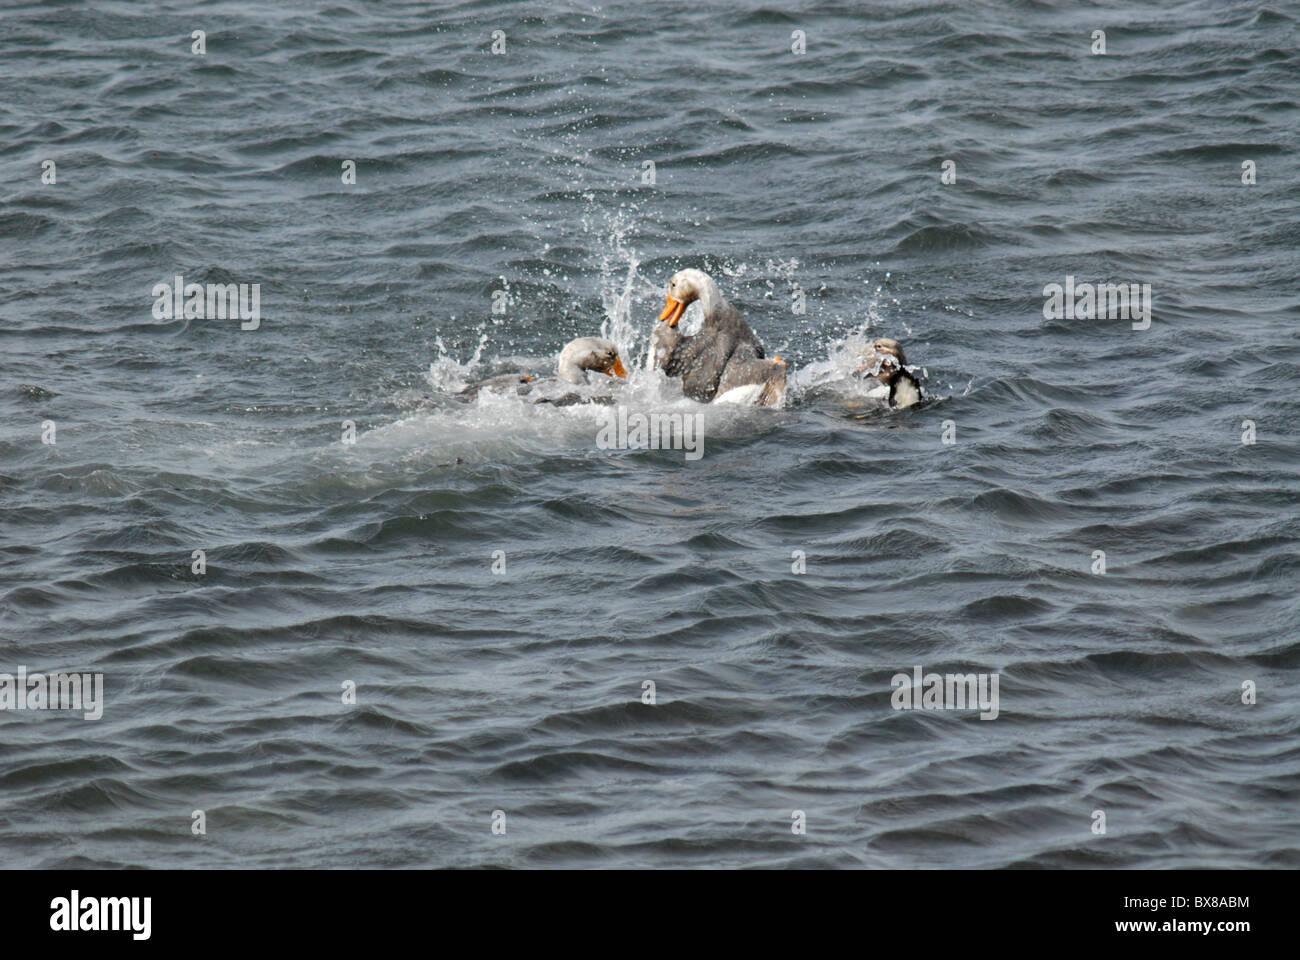 Two male Falkland Islands flightless steamer ducks (Tachyeres brachypterus), fighting in the water, Carcass Island, Stock Photo